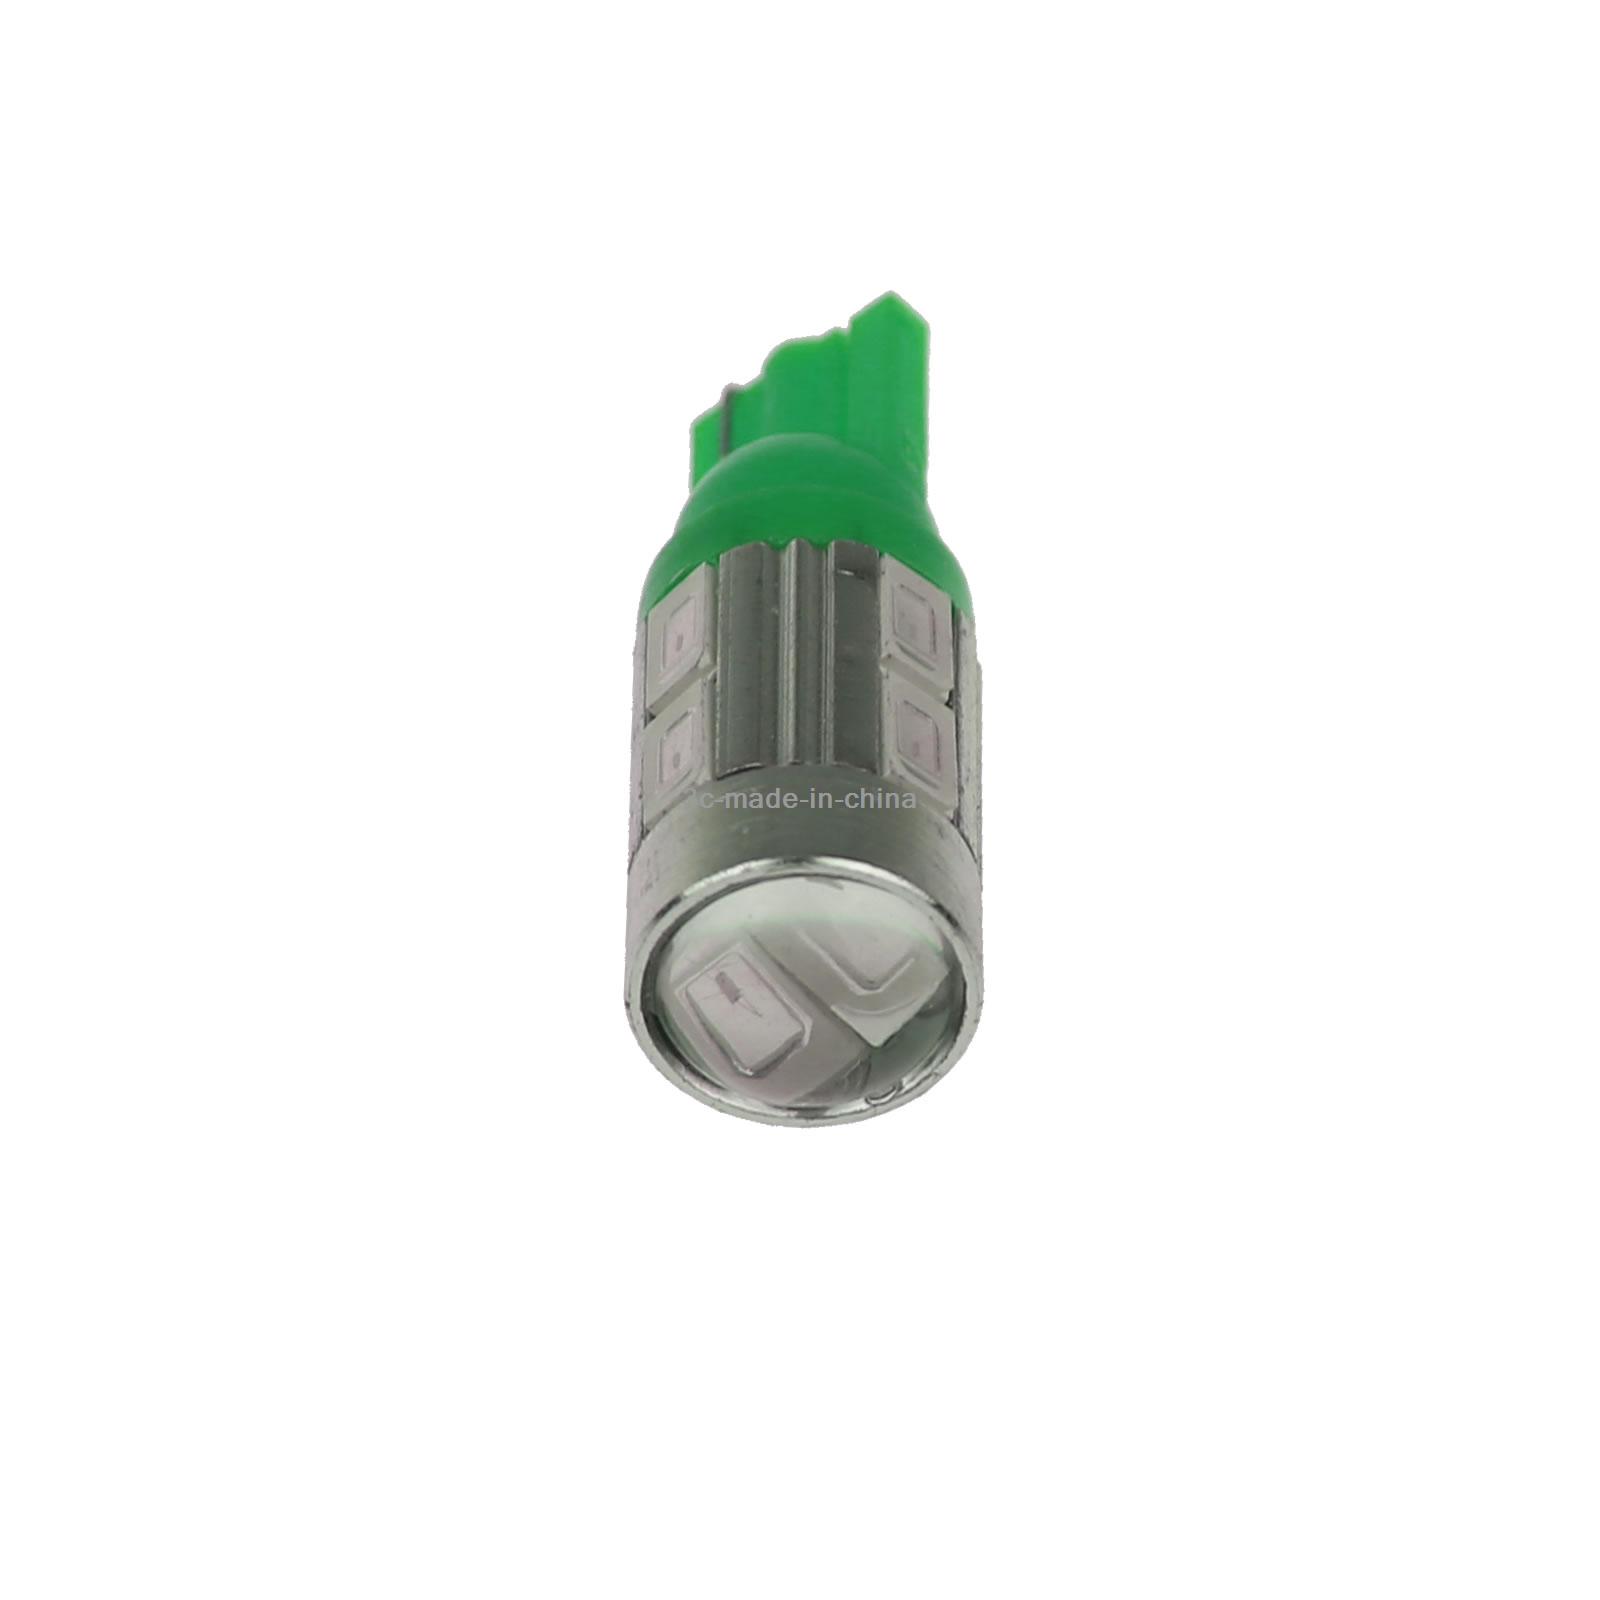 2x Green Car T10 W5W Generation Bulb Interior Light Lens 10 5630 SMD LED A061